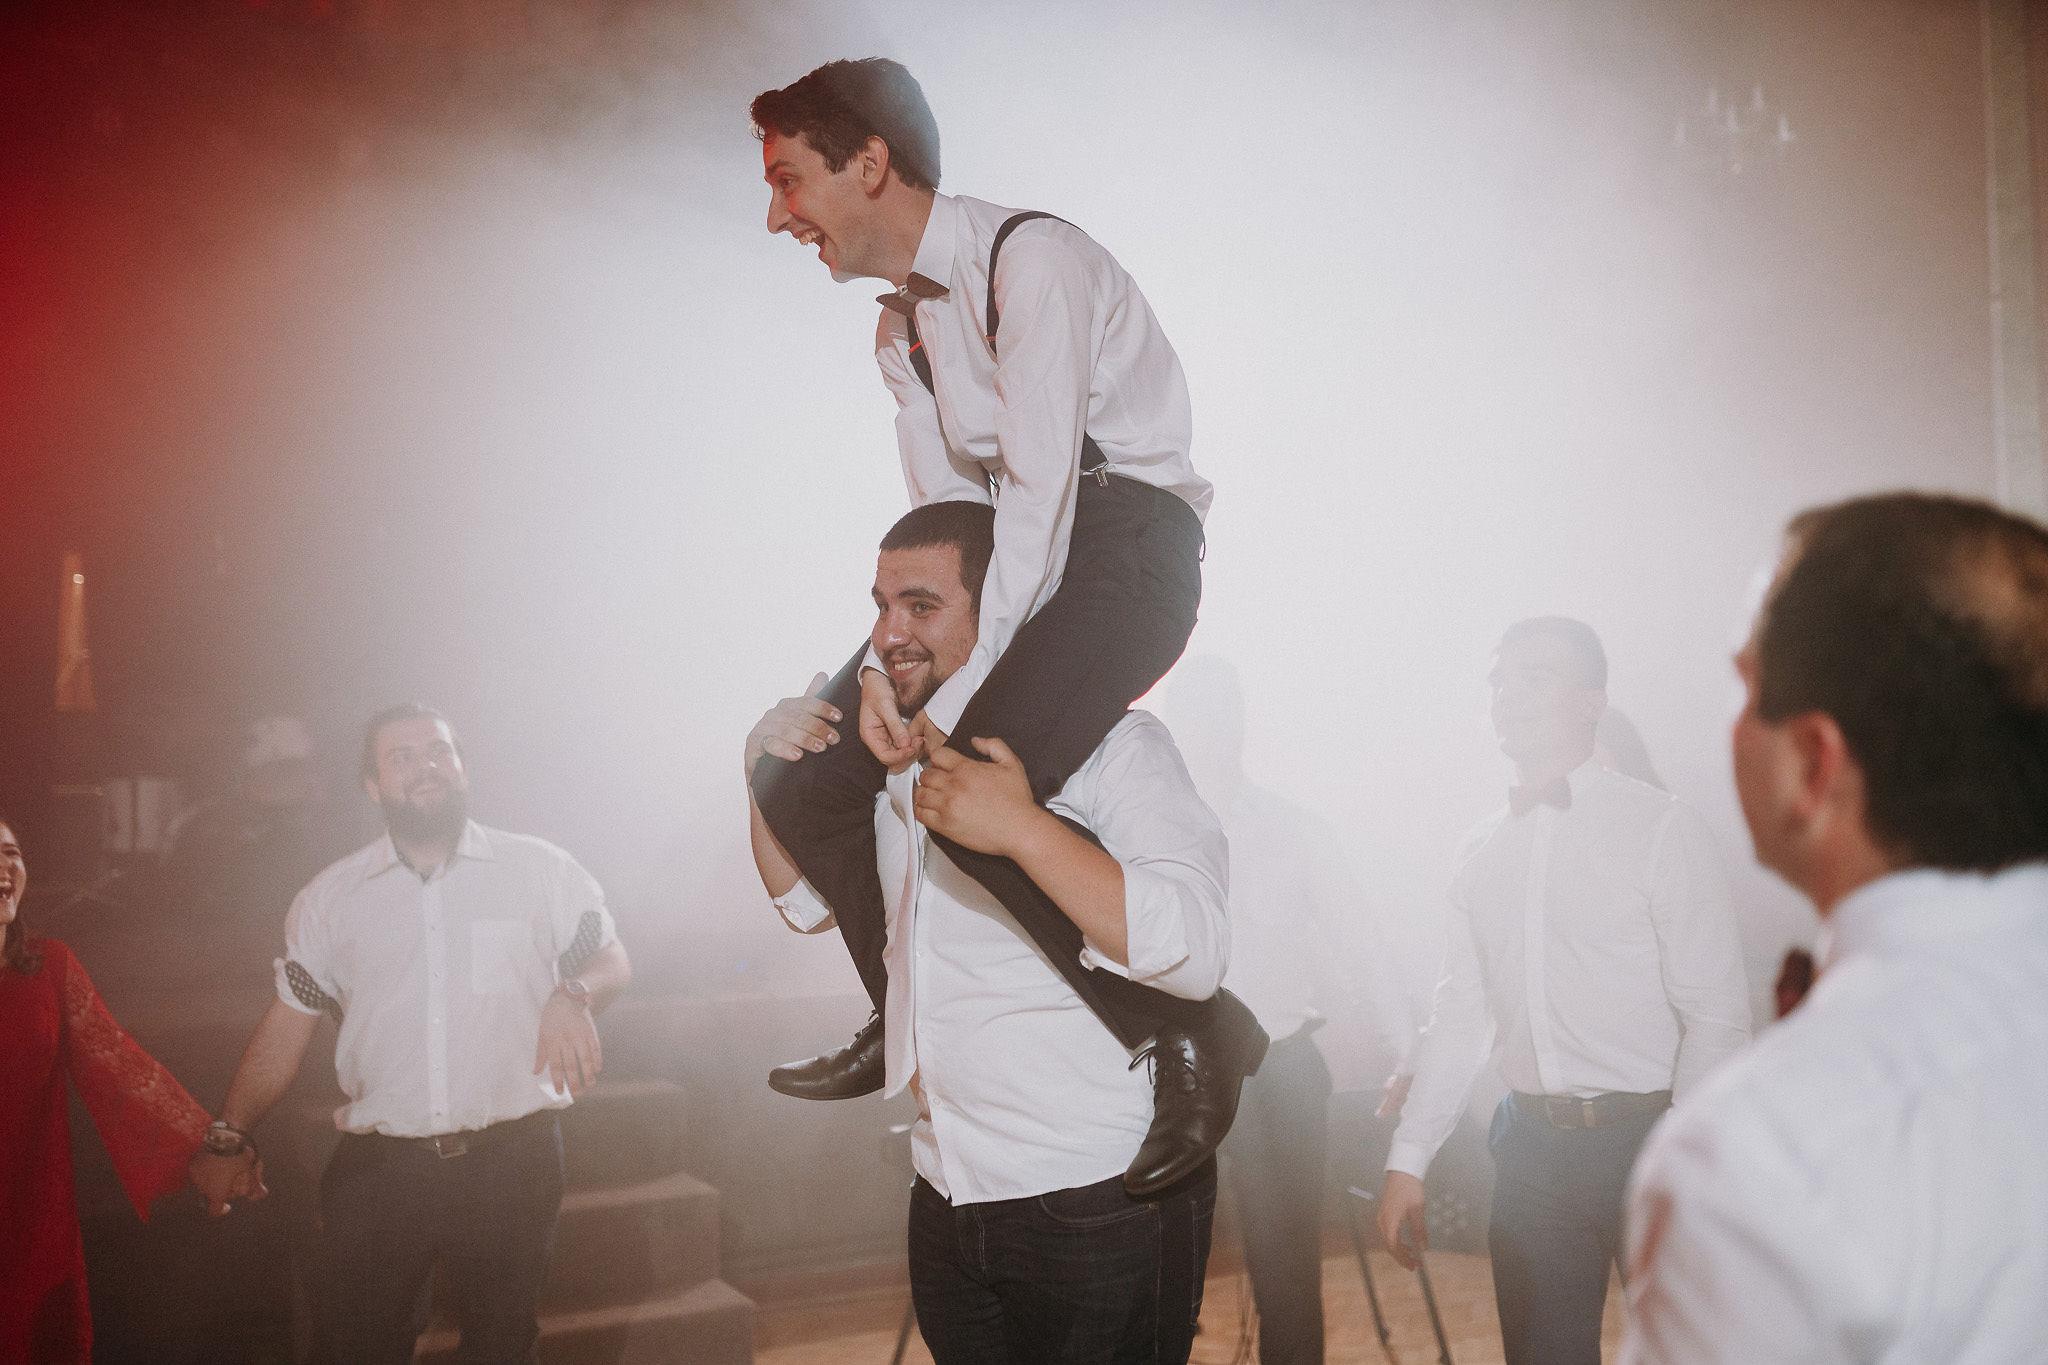 Svadba Hlohovec, Empirove divadlo 04 #svadobnyDJ, #djanasvadbu, #svadba, #svadbahlohovec, #Hlohovec #DJAnavi, #empirovedivadlo